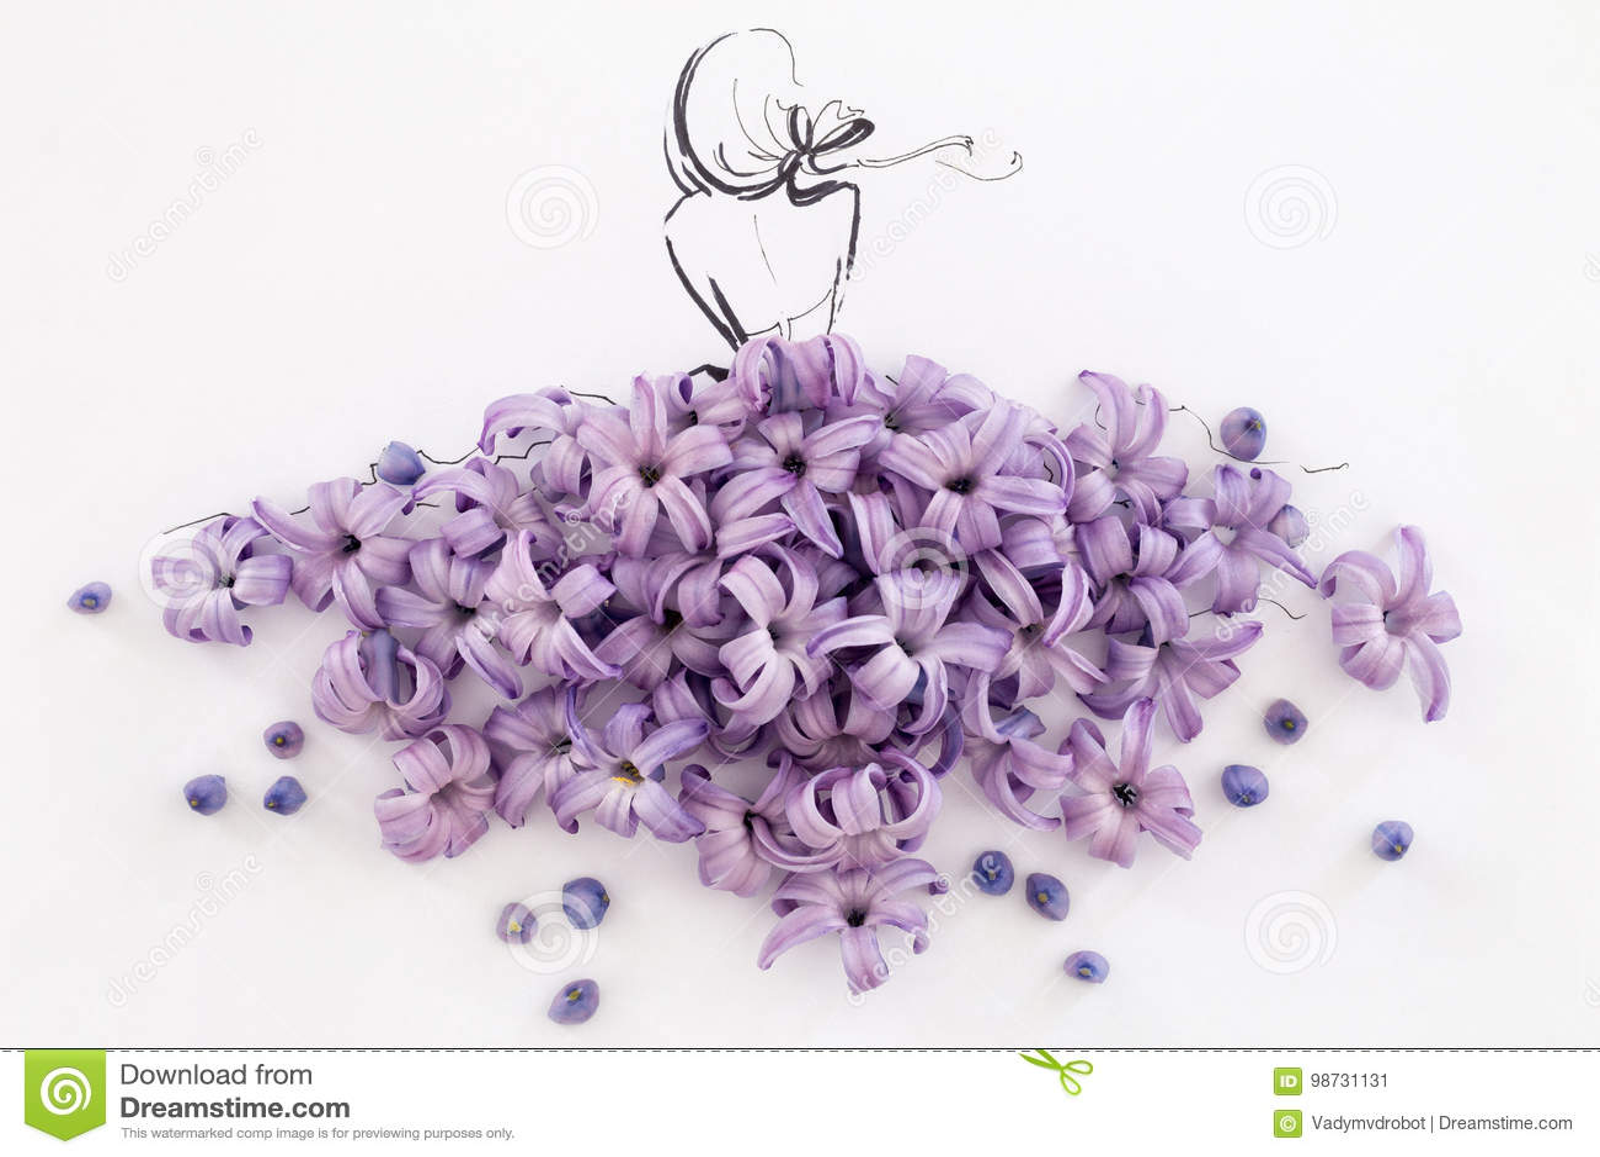 Hand Drawn Ballerina Wearing Dress Made Of Natural Flowers ...